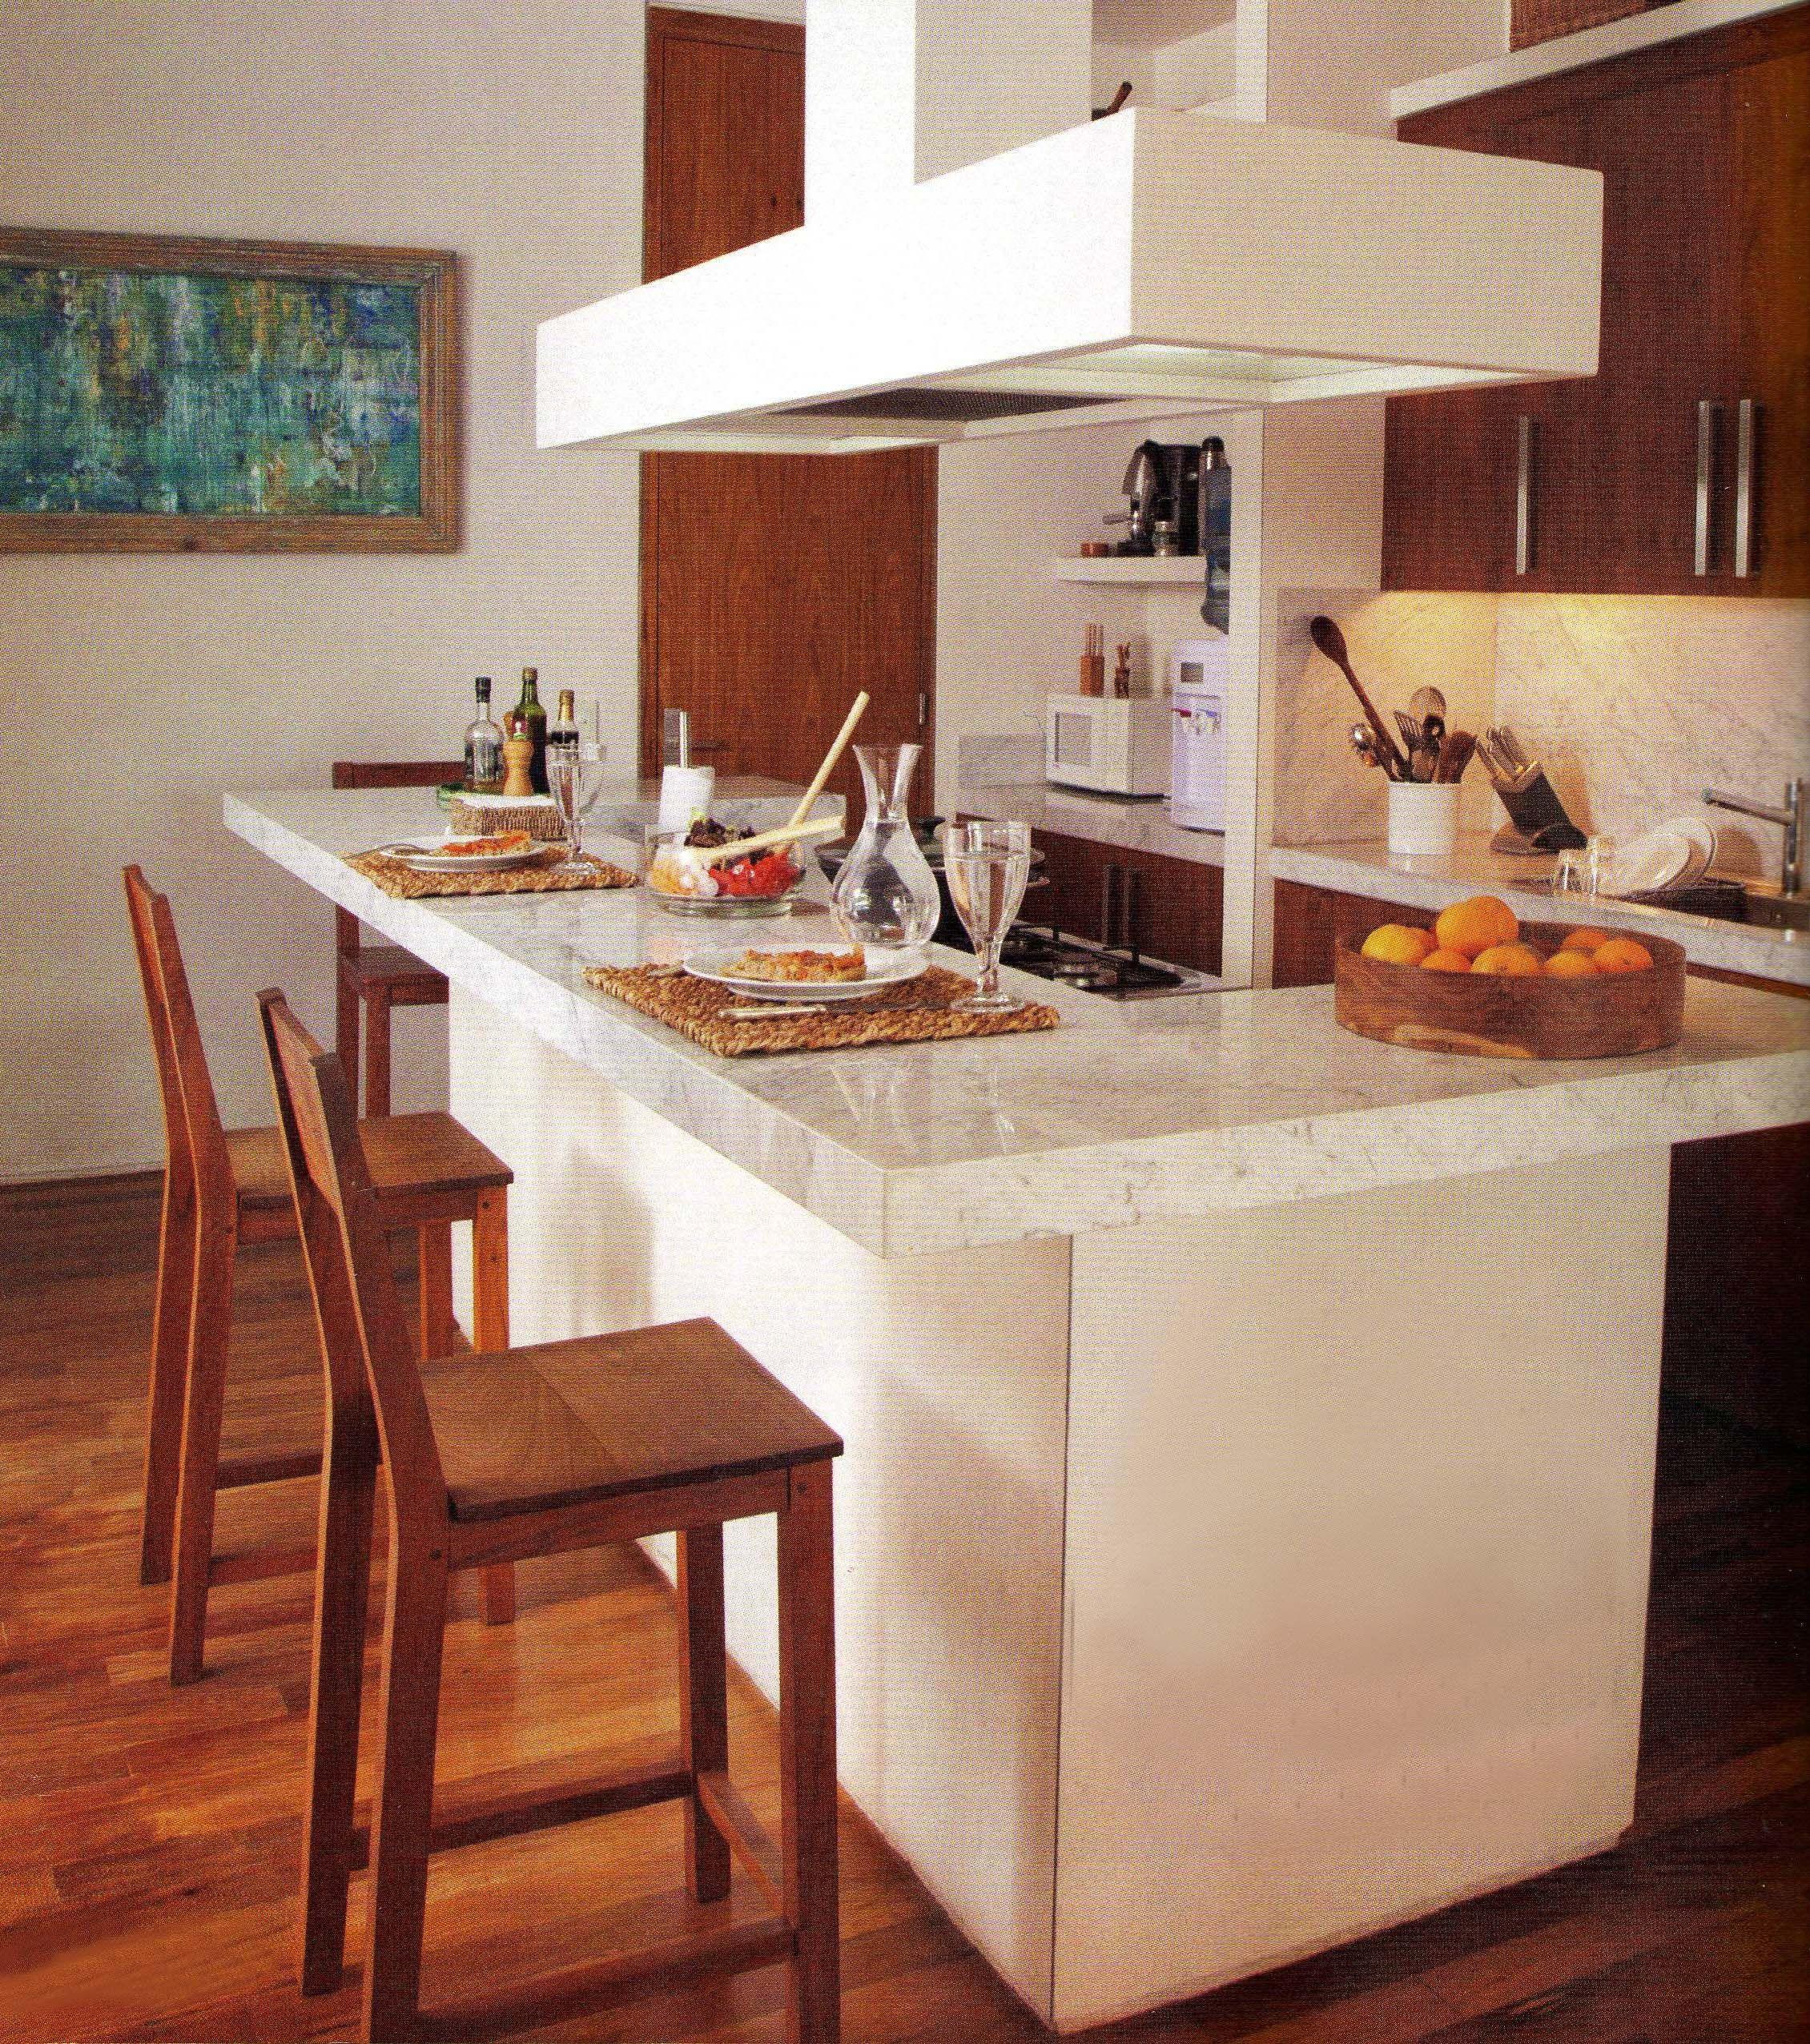 Barra de cocina barras de cocinas y bares pinterest for Barras de cocina